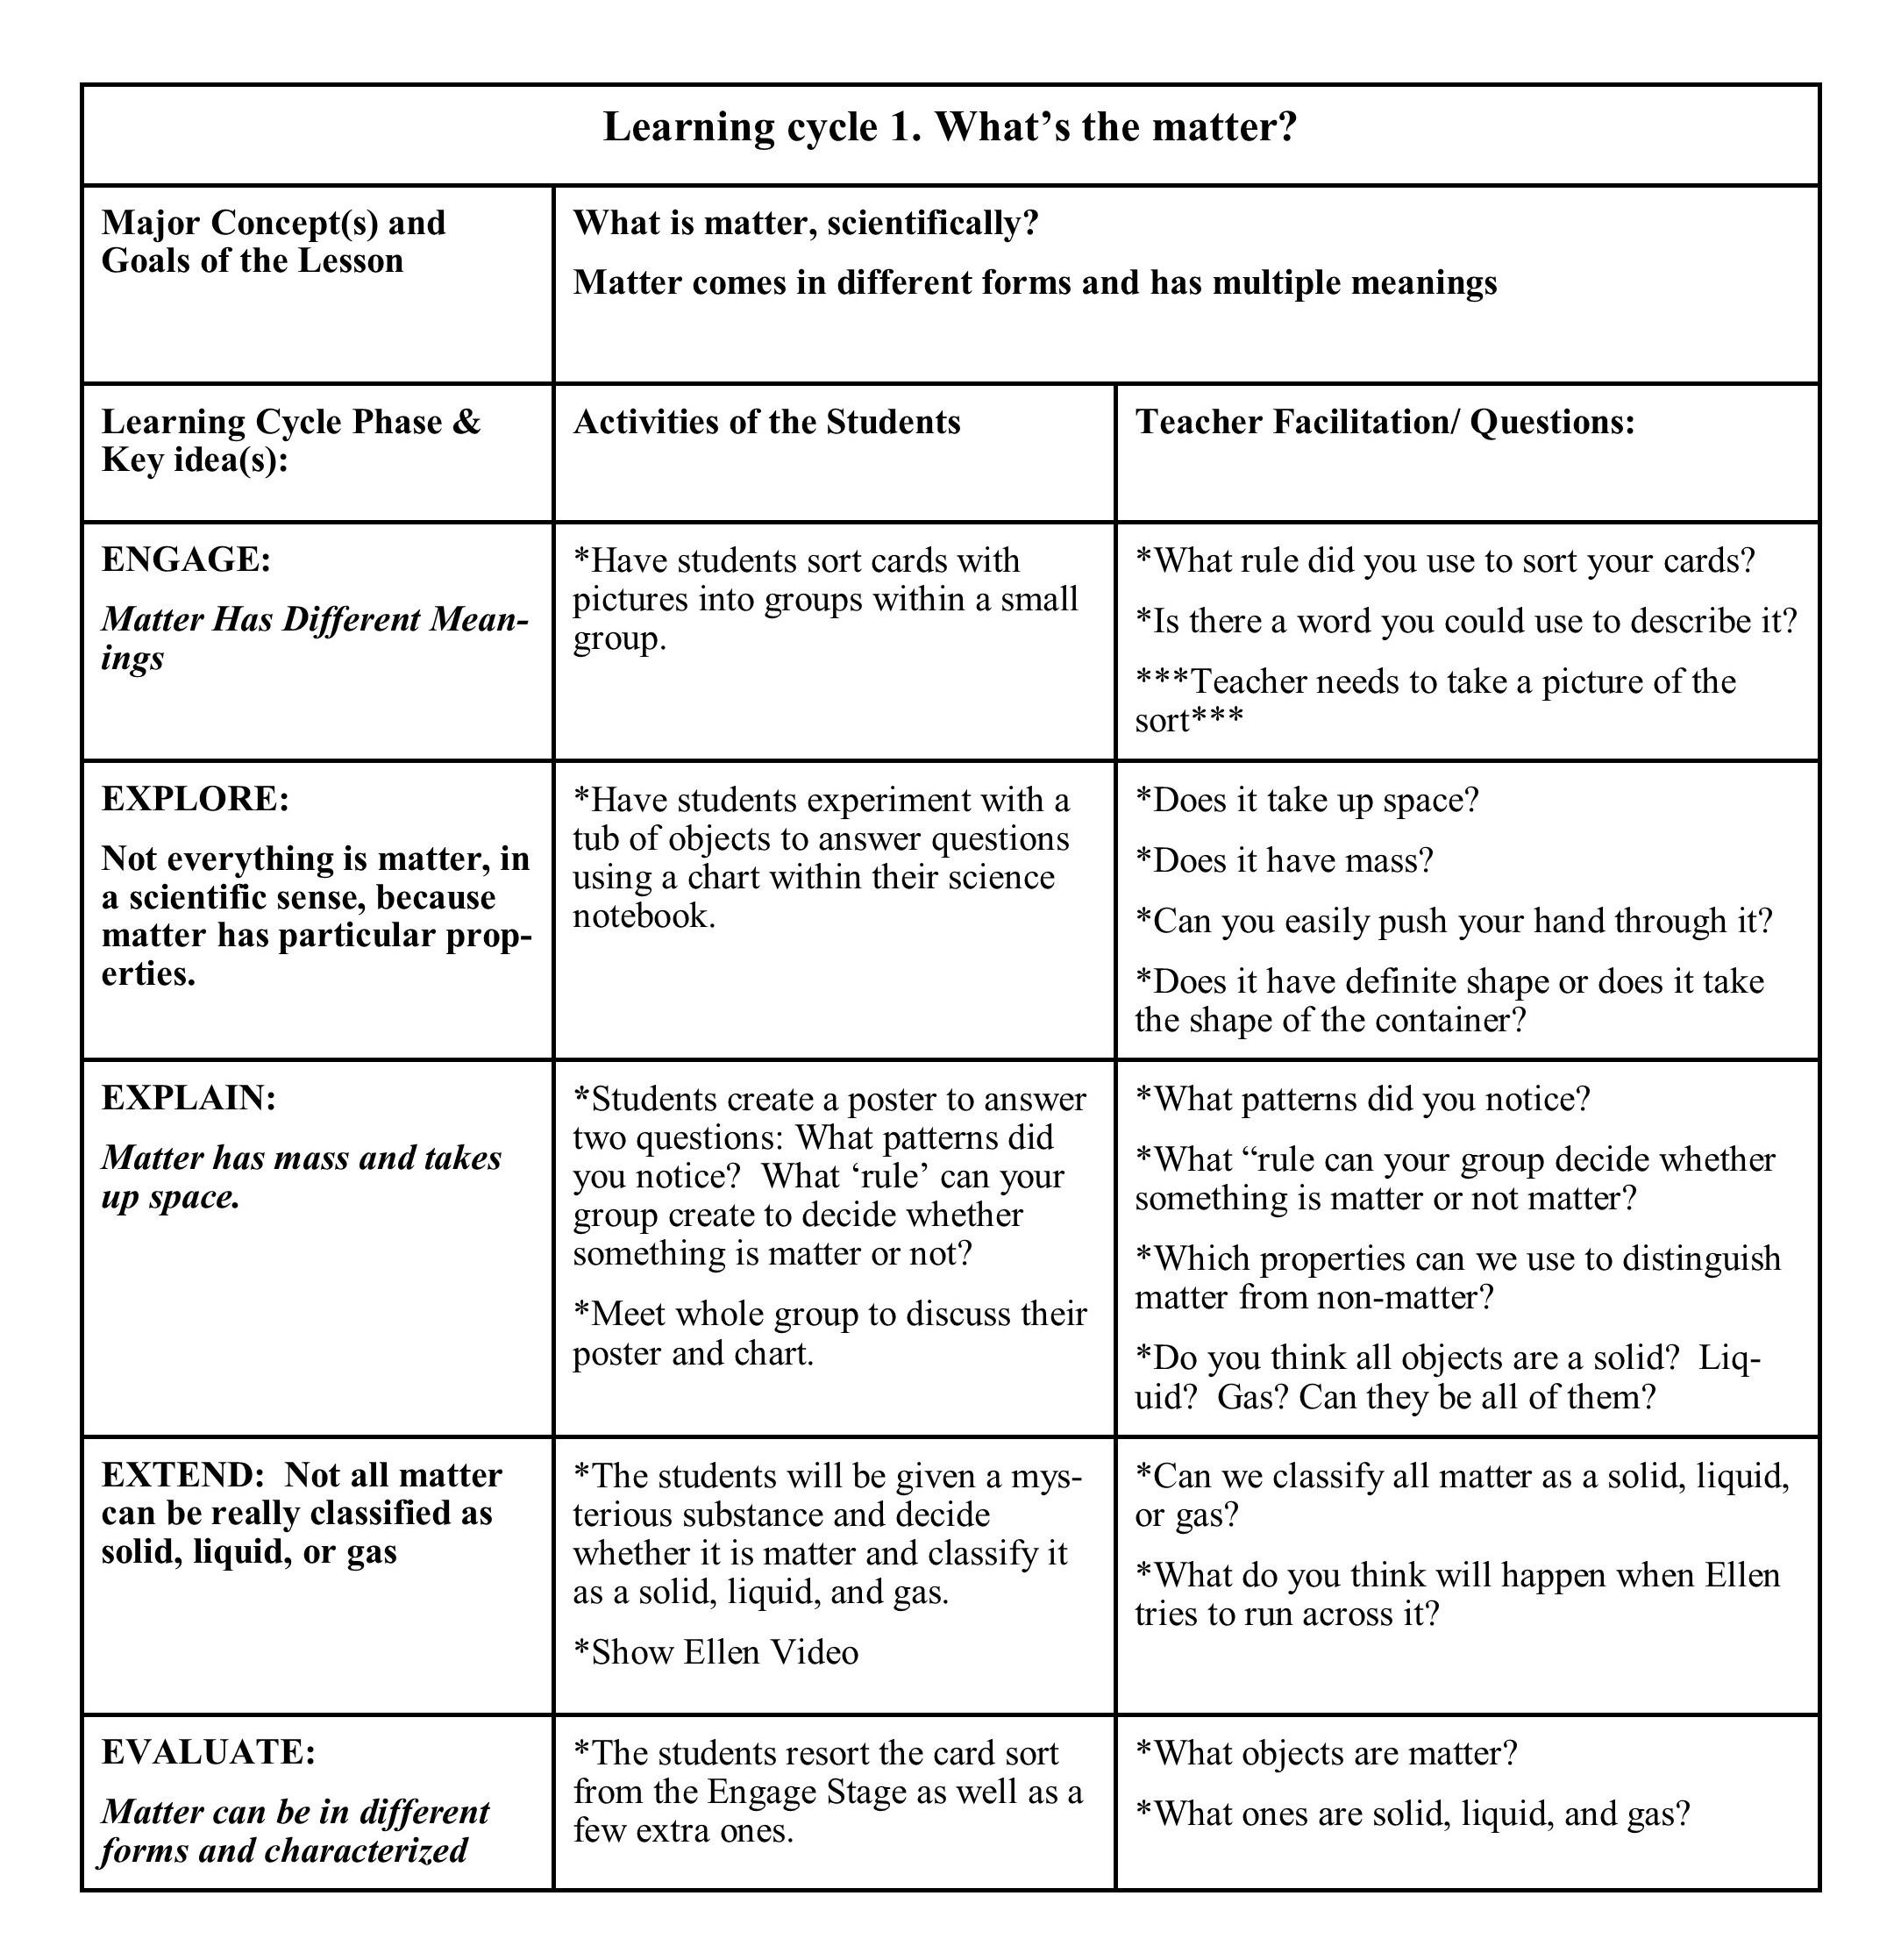 Elementary Education | Innovations in Science Teacher Education